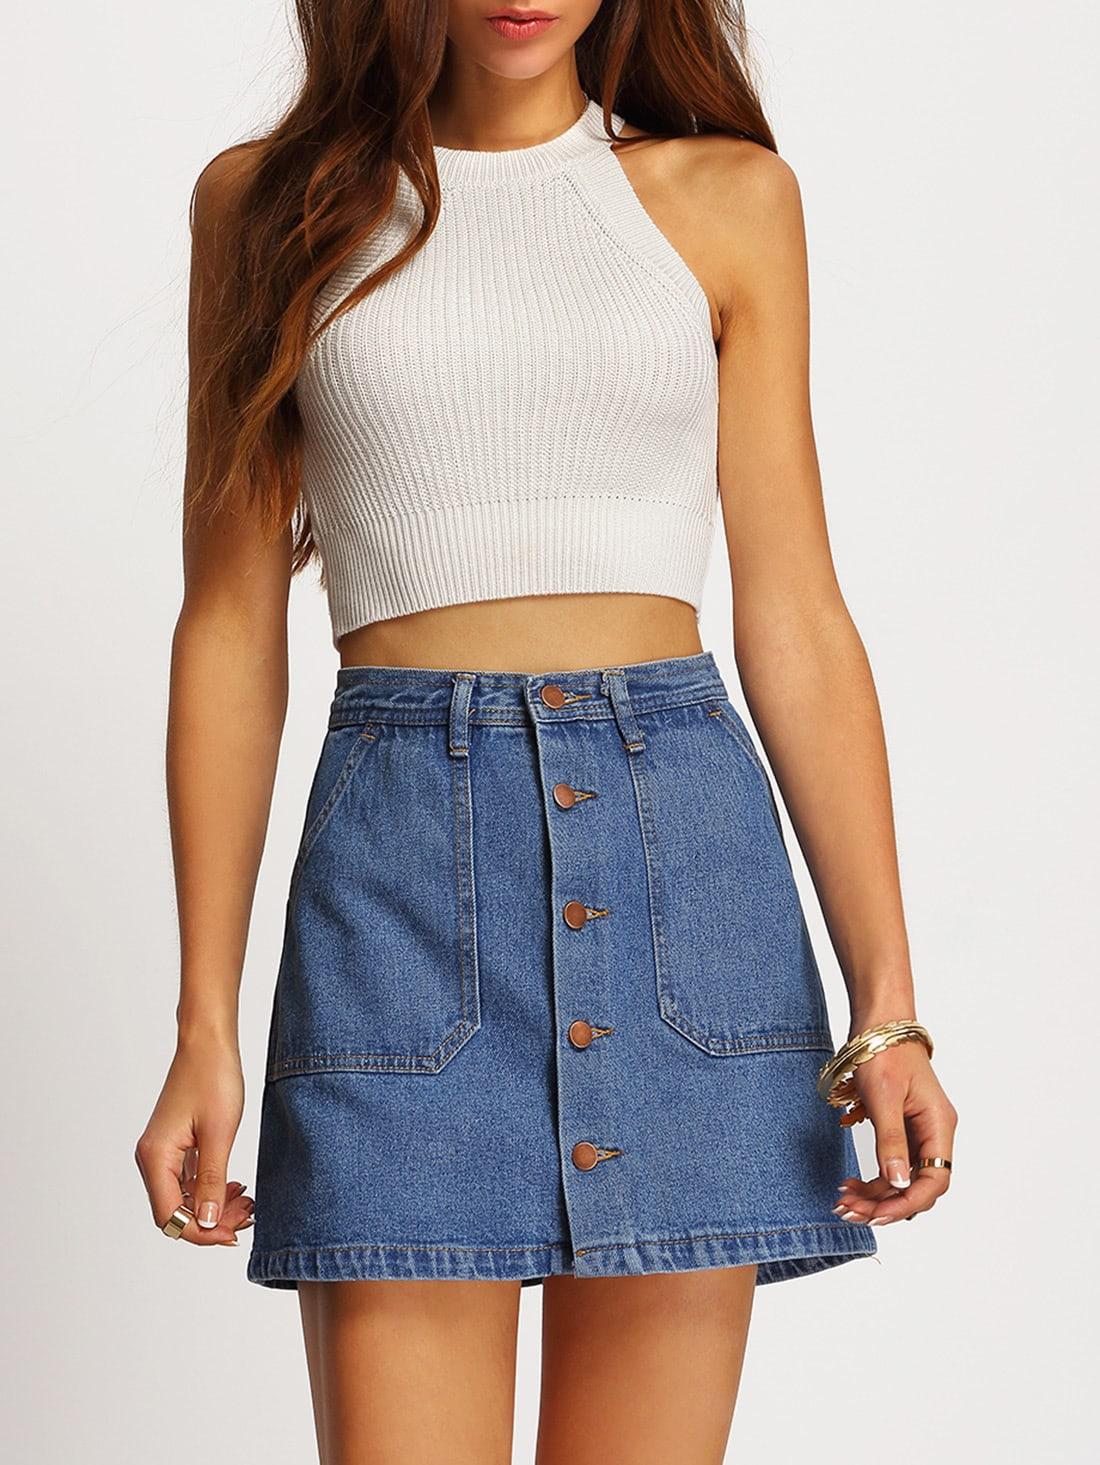 Single Breasted Denim A-Line Skirt